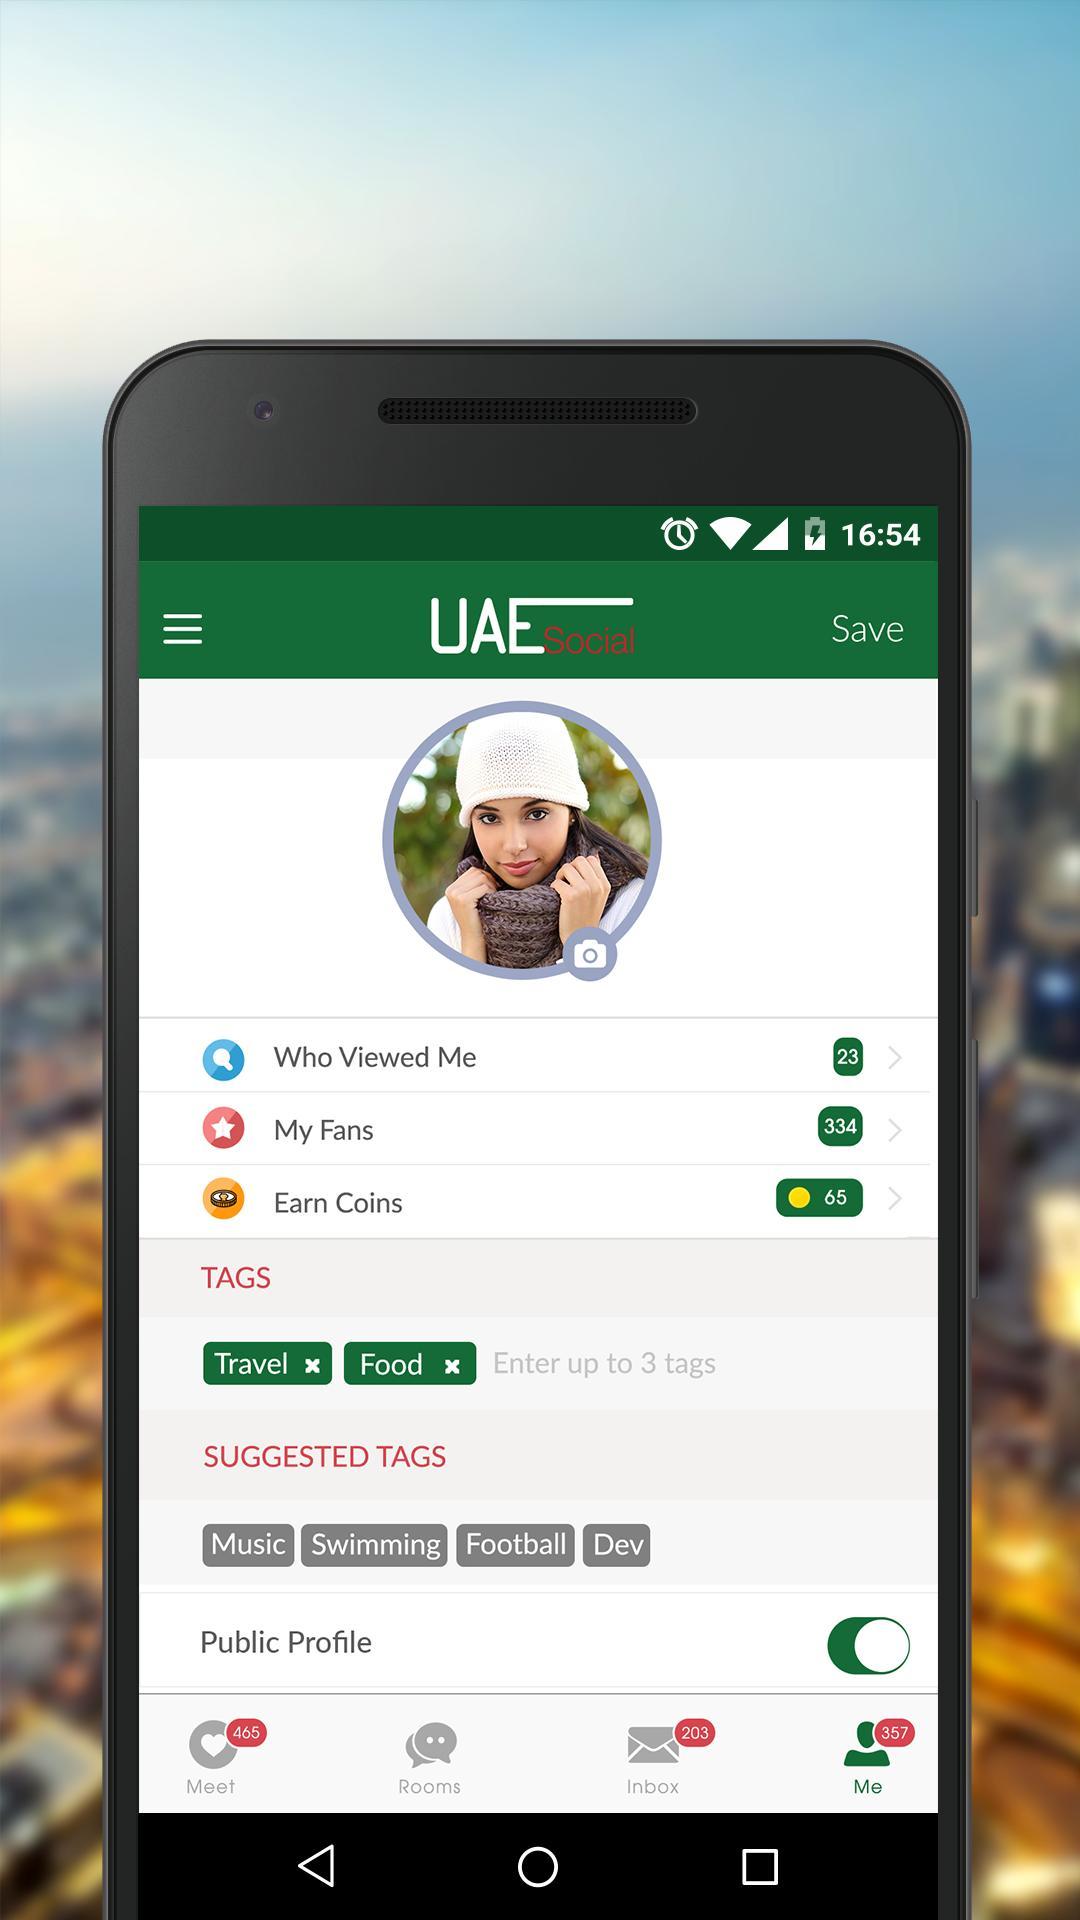 online dating apps UAE